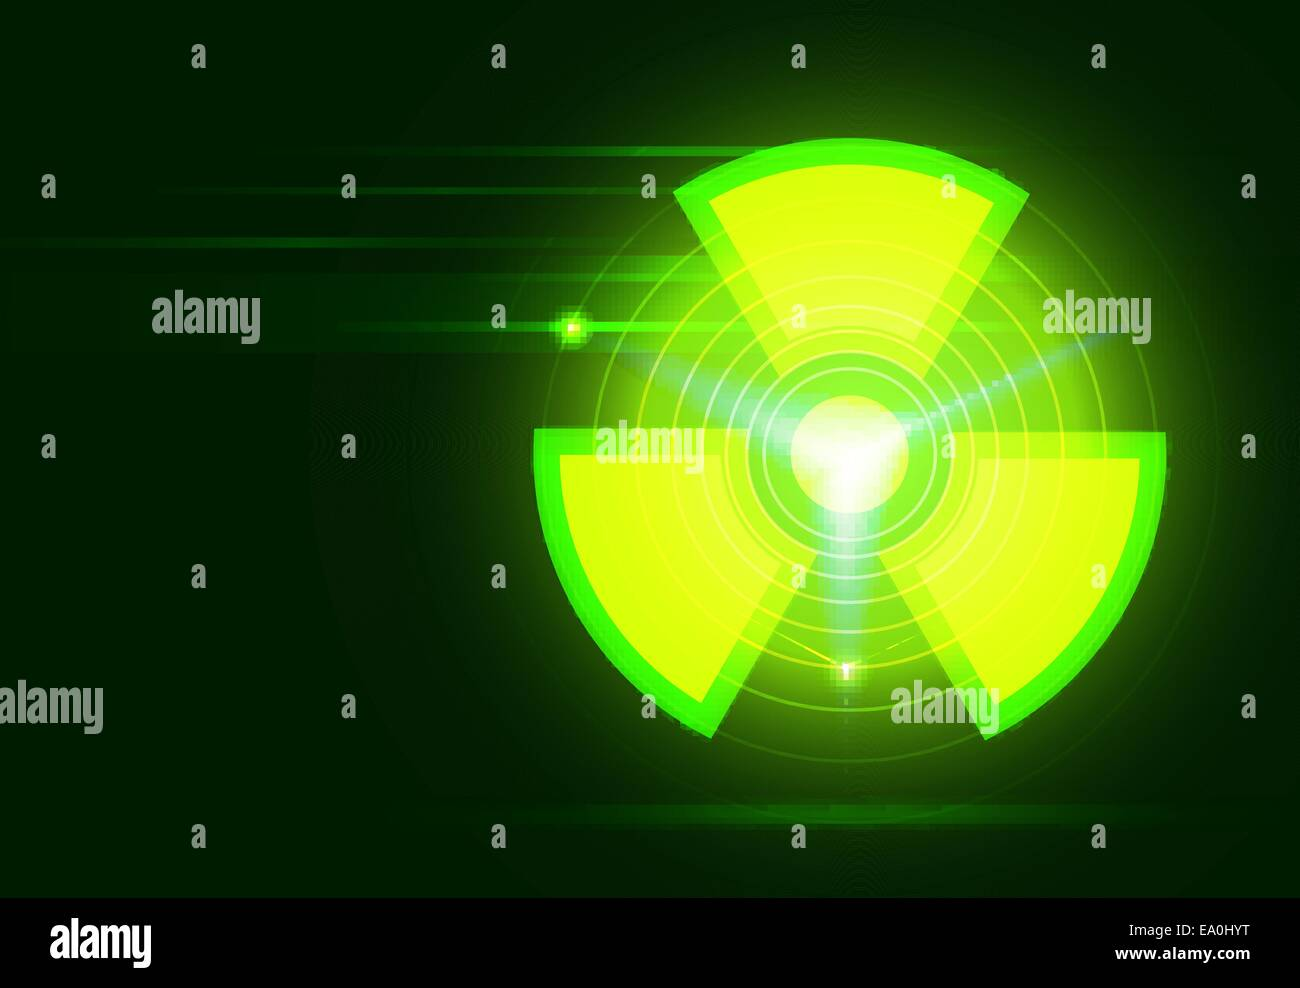 vector bio-hazard symbol on dark green background, transparency and gradient mesh used - Stock Vector